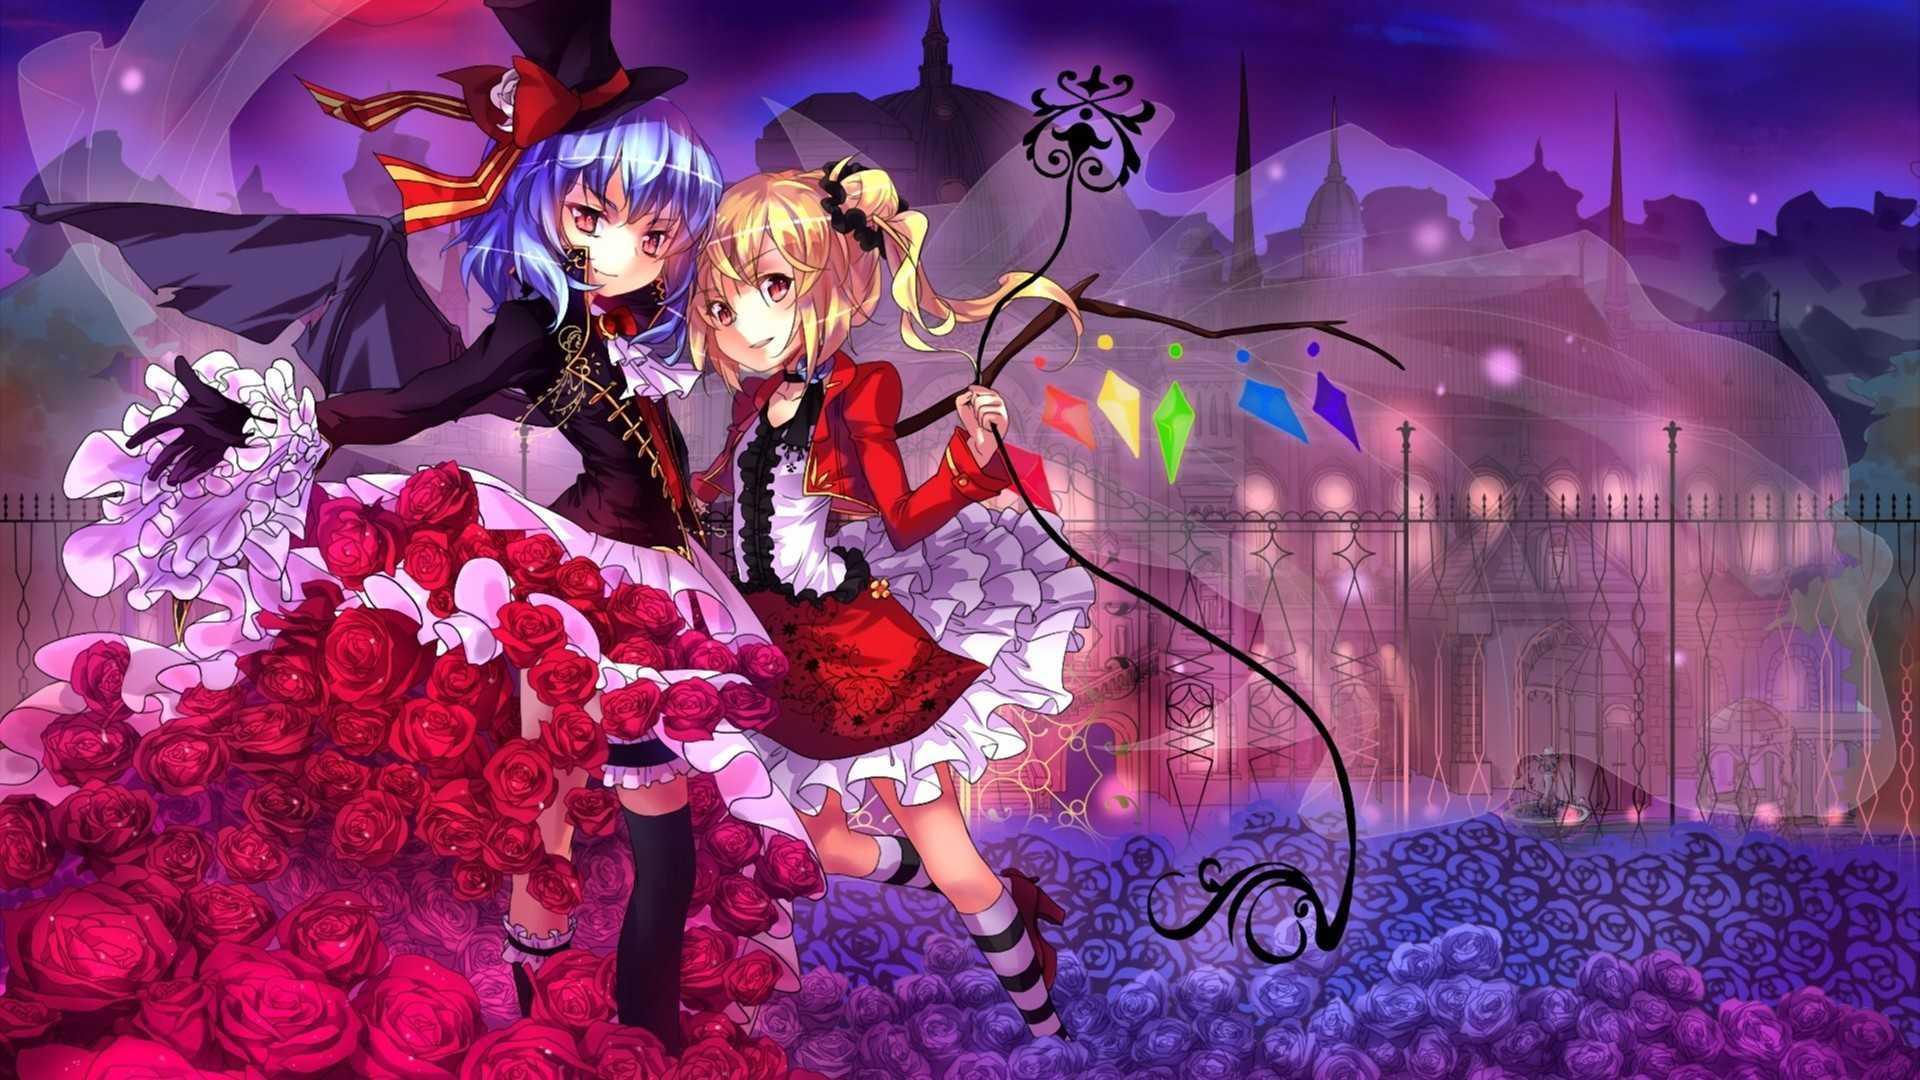 Download Clownpiece Touhou Fairy Blonde Wings